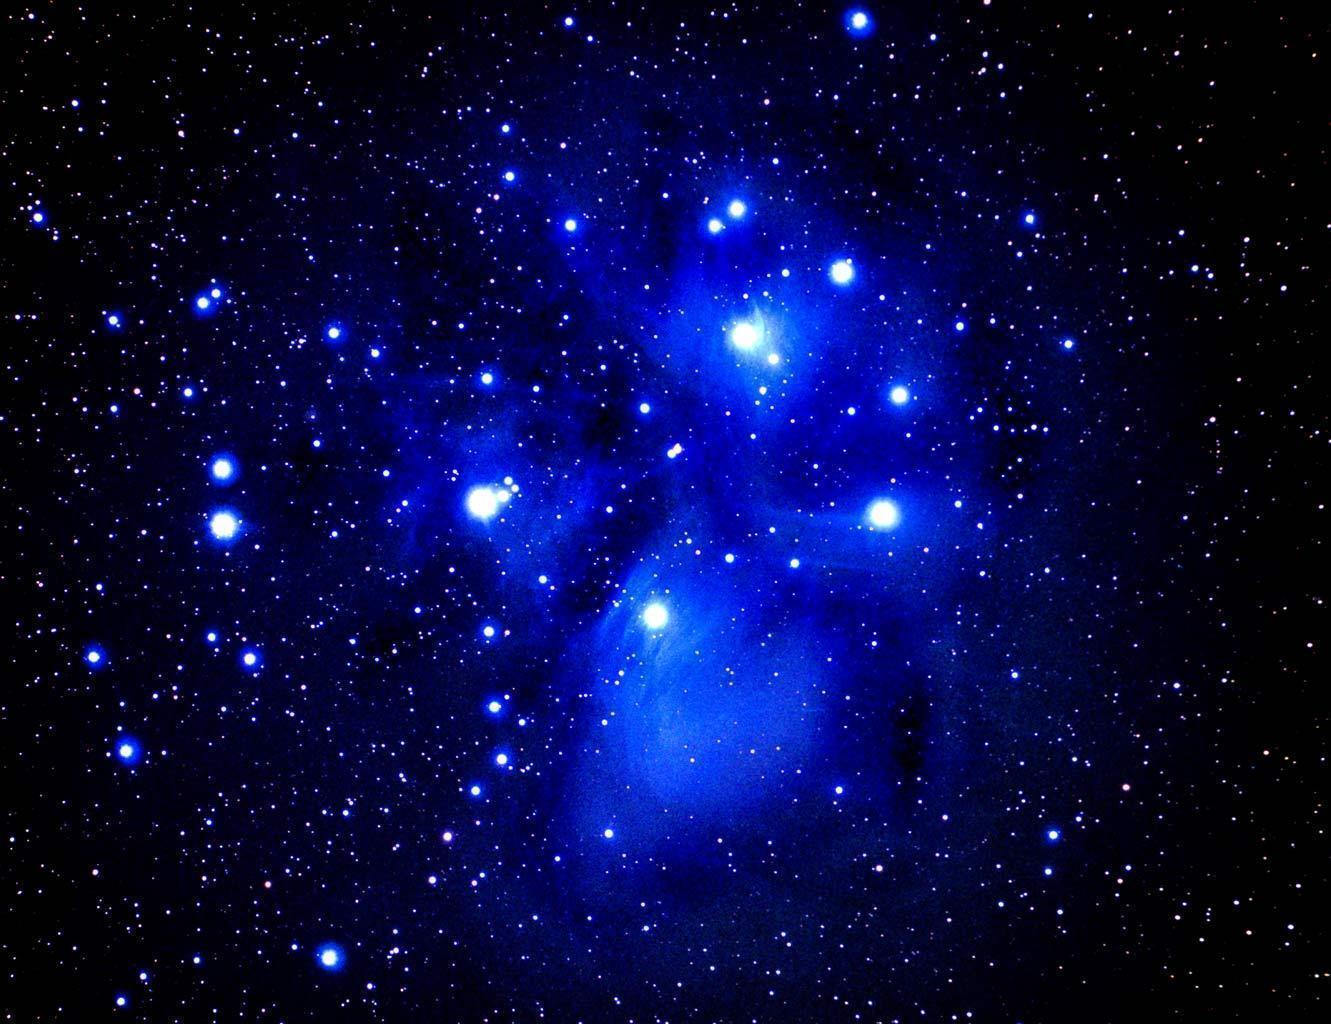 starcluster wallpaper - photo #7